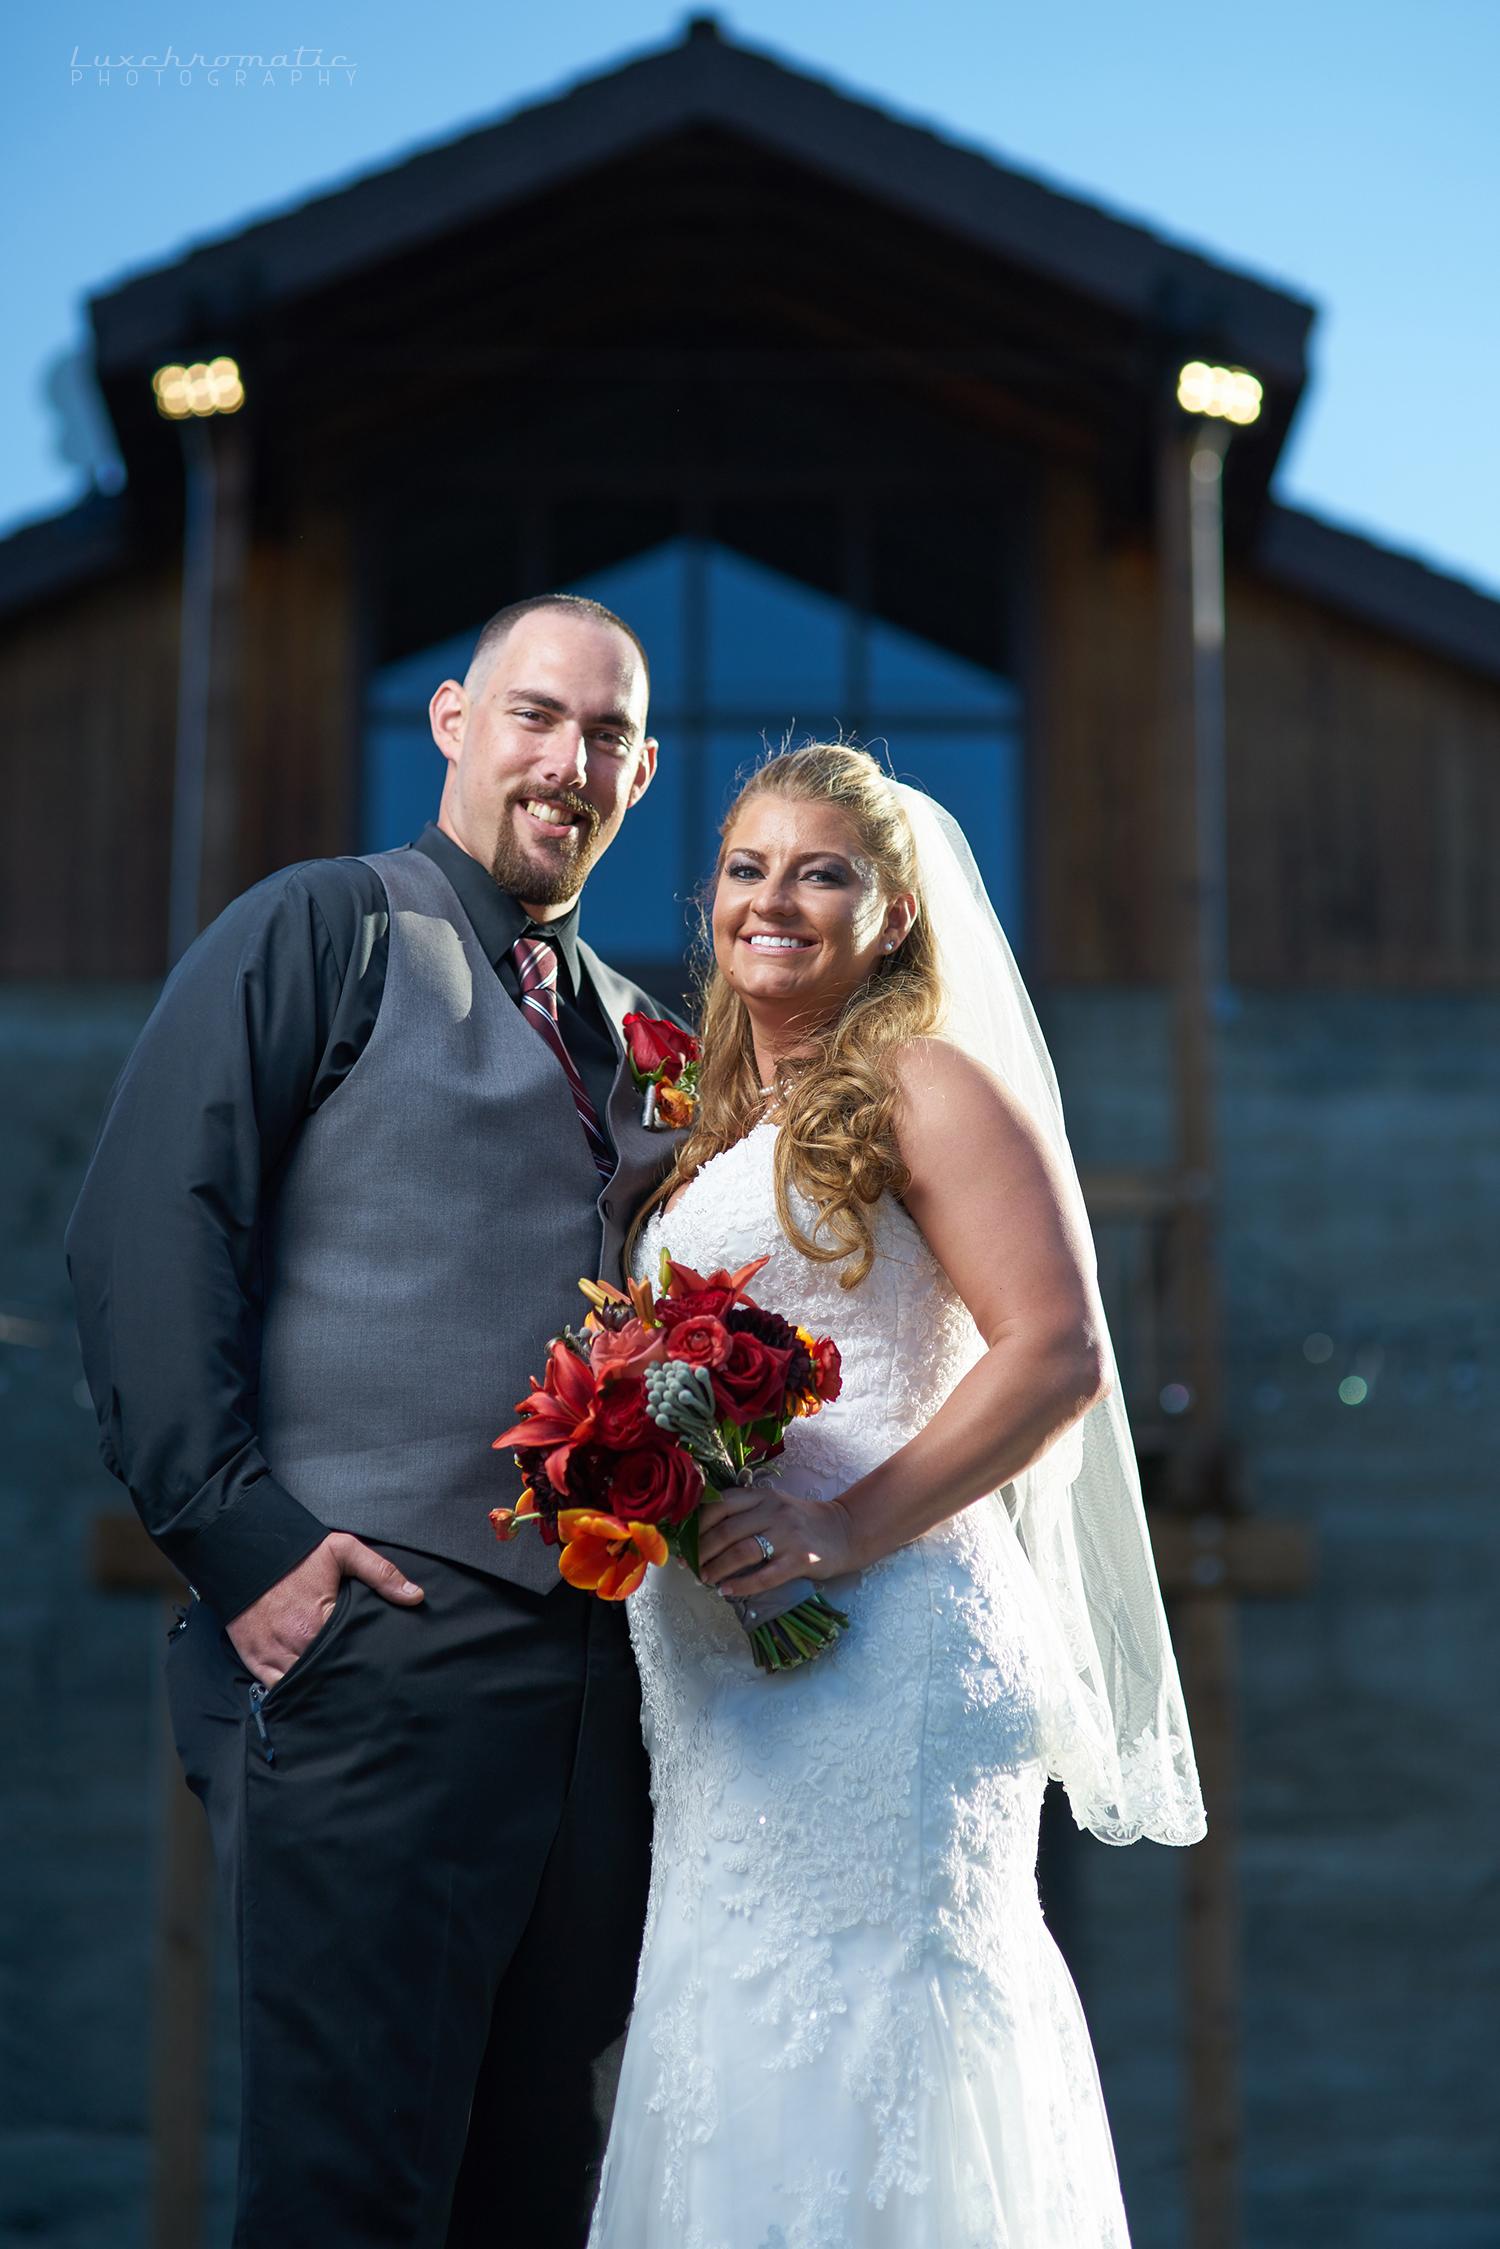 081217_Rachel_Chris_a0595-weddingdress-bride-weddingphotography-weddingphotographer-bridal-groom-wedding-engagementring-proposal-brides-diamondring-sonyalpha-sony-sonya9-sonya7rii-sanfrancisco-sf-bayarea-photographer-profoto-murrietas-well.jpg